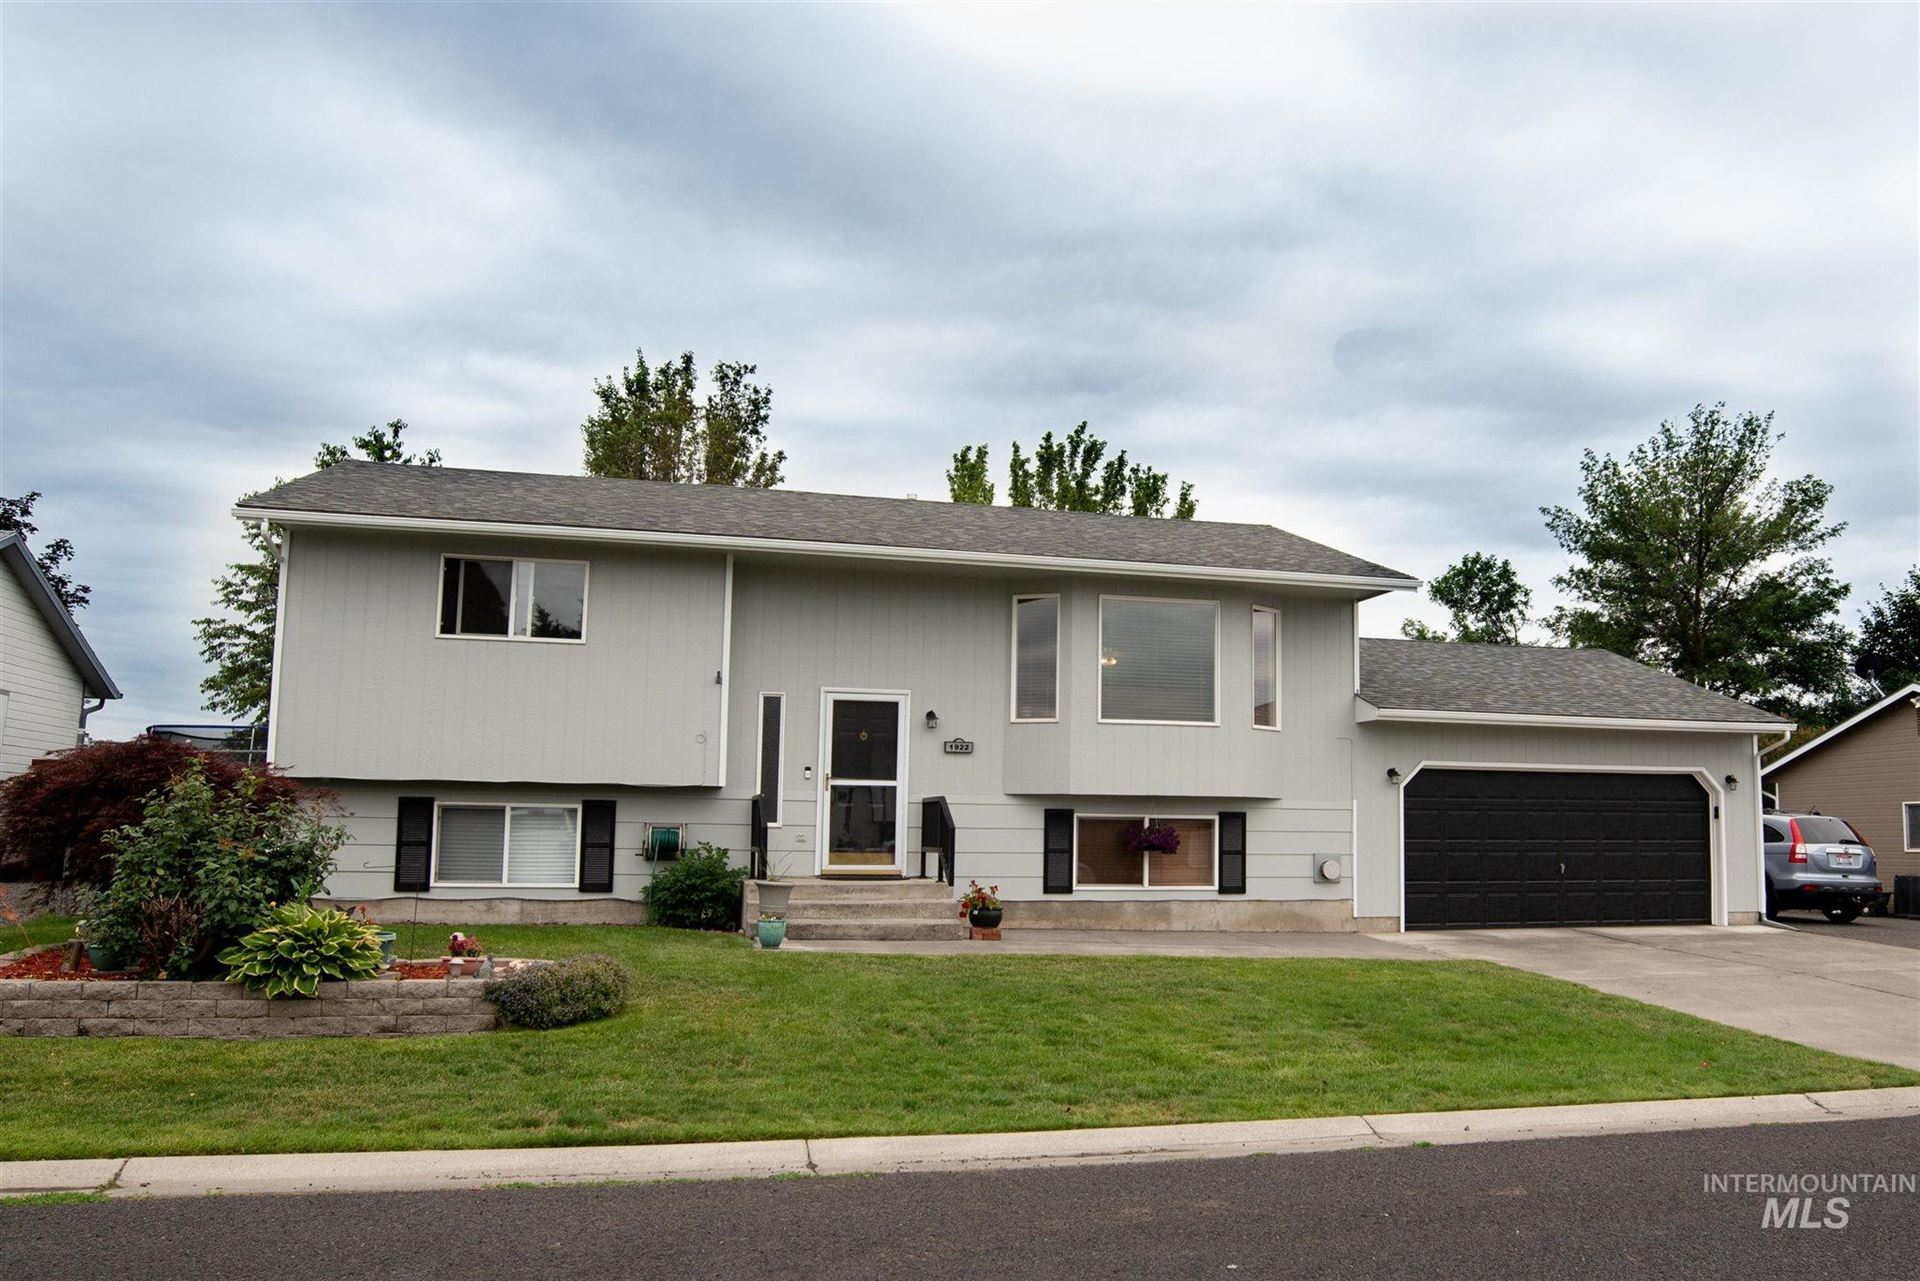 Photo of 1922 Birch Ave., Lewiston, ID 83501 (MLS # 98807192)